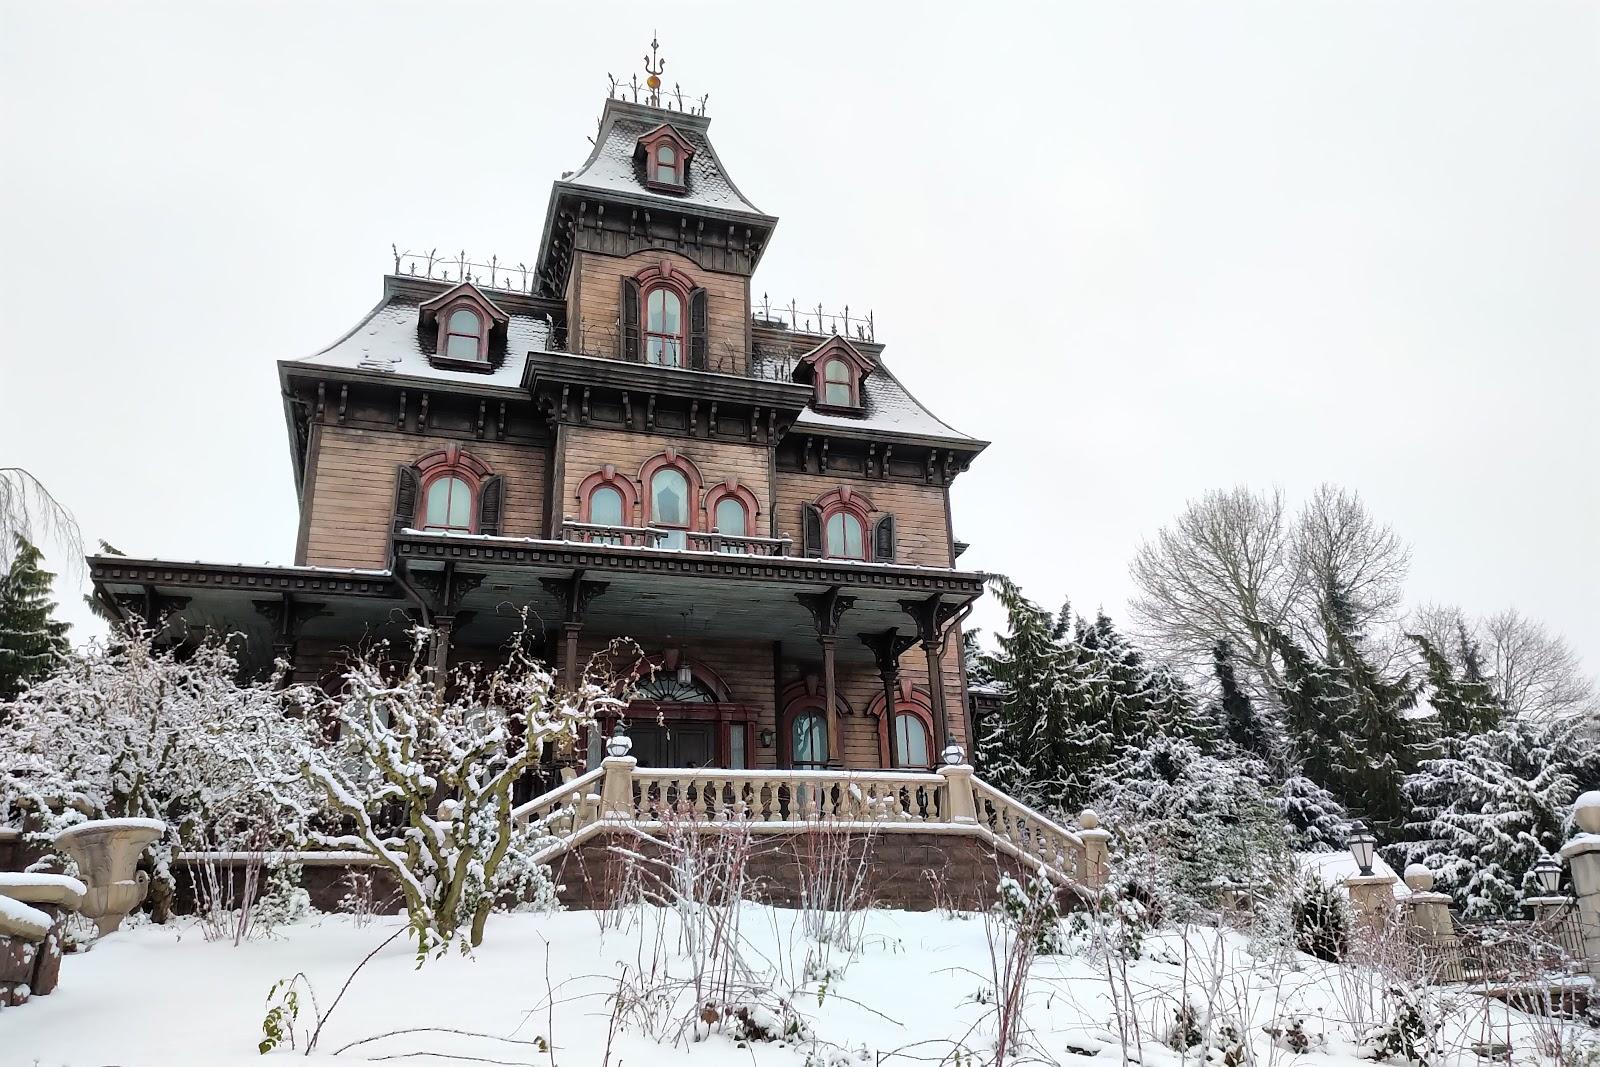 Disneyland Paris Sees Snowfall Making The Gorgeous Park